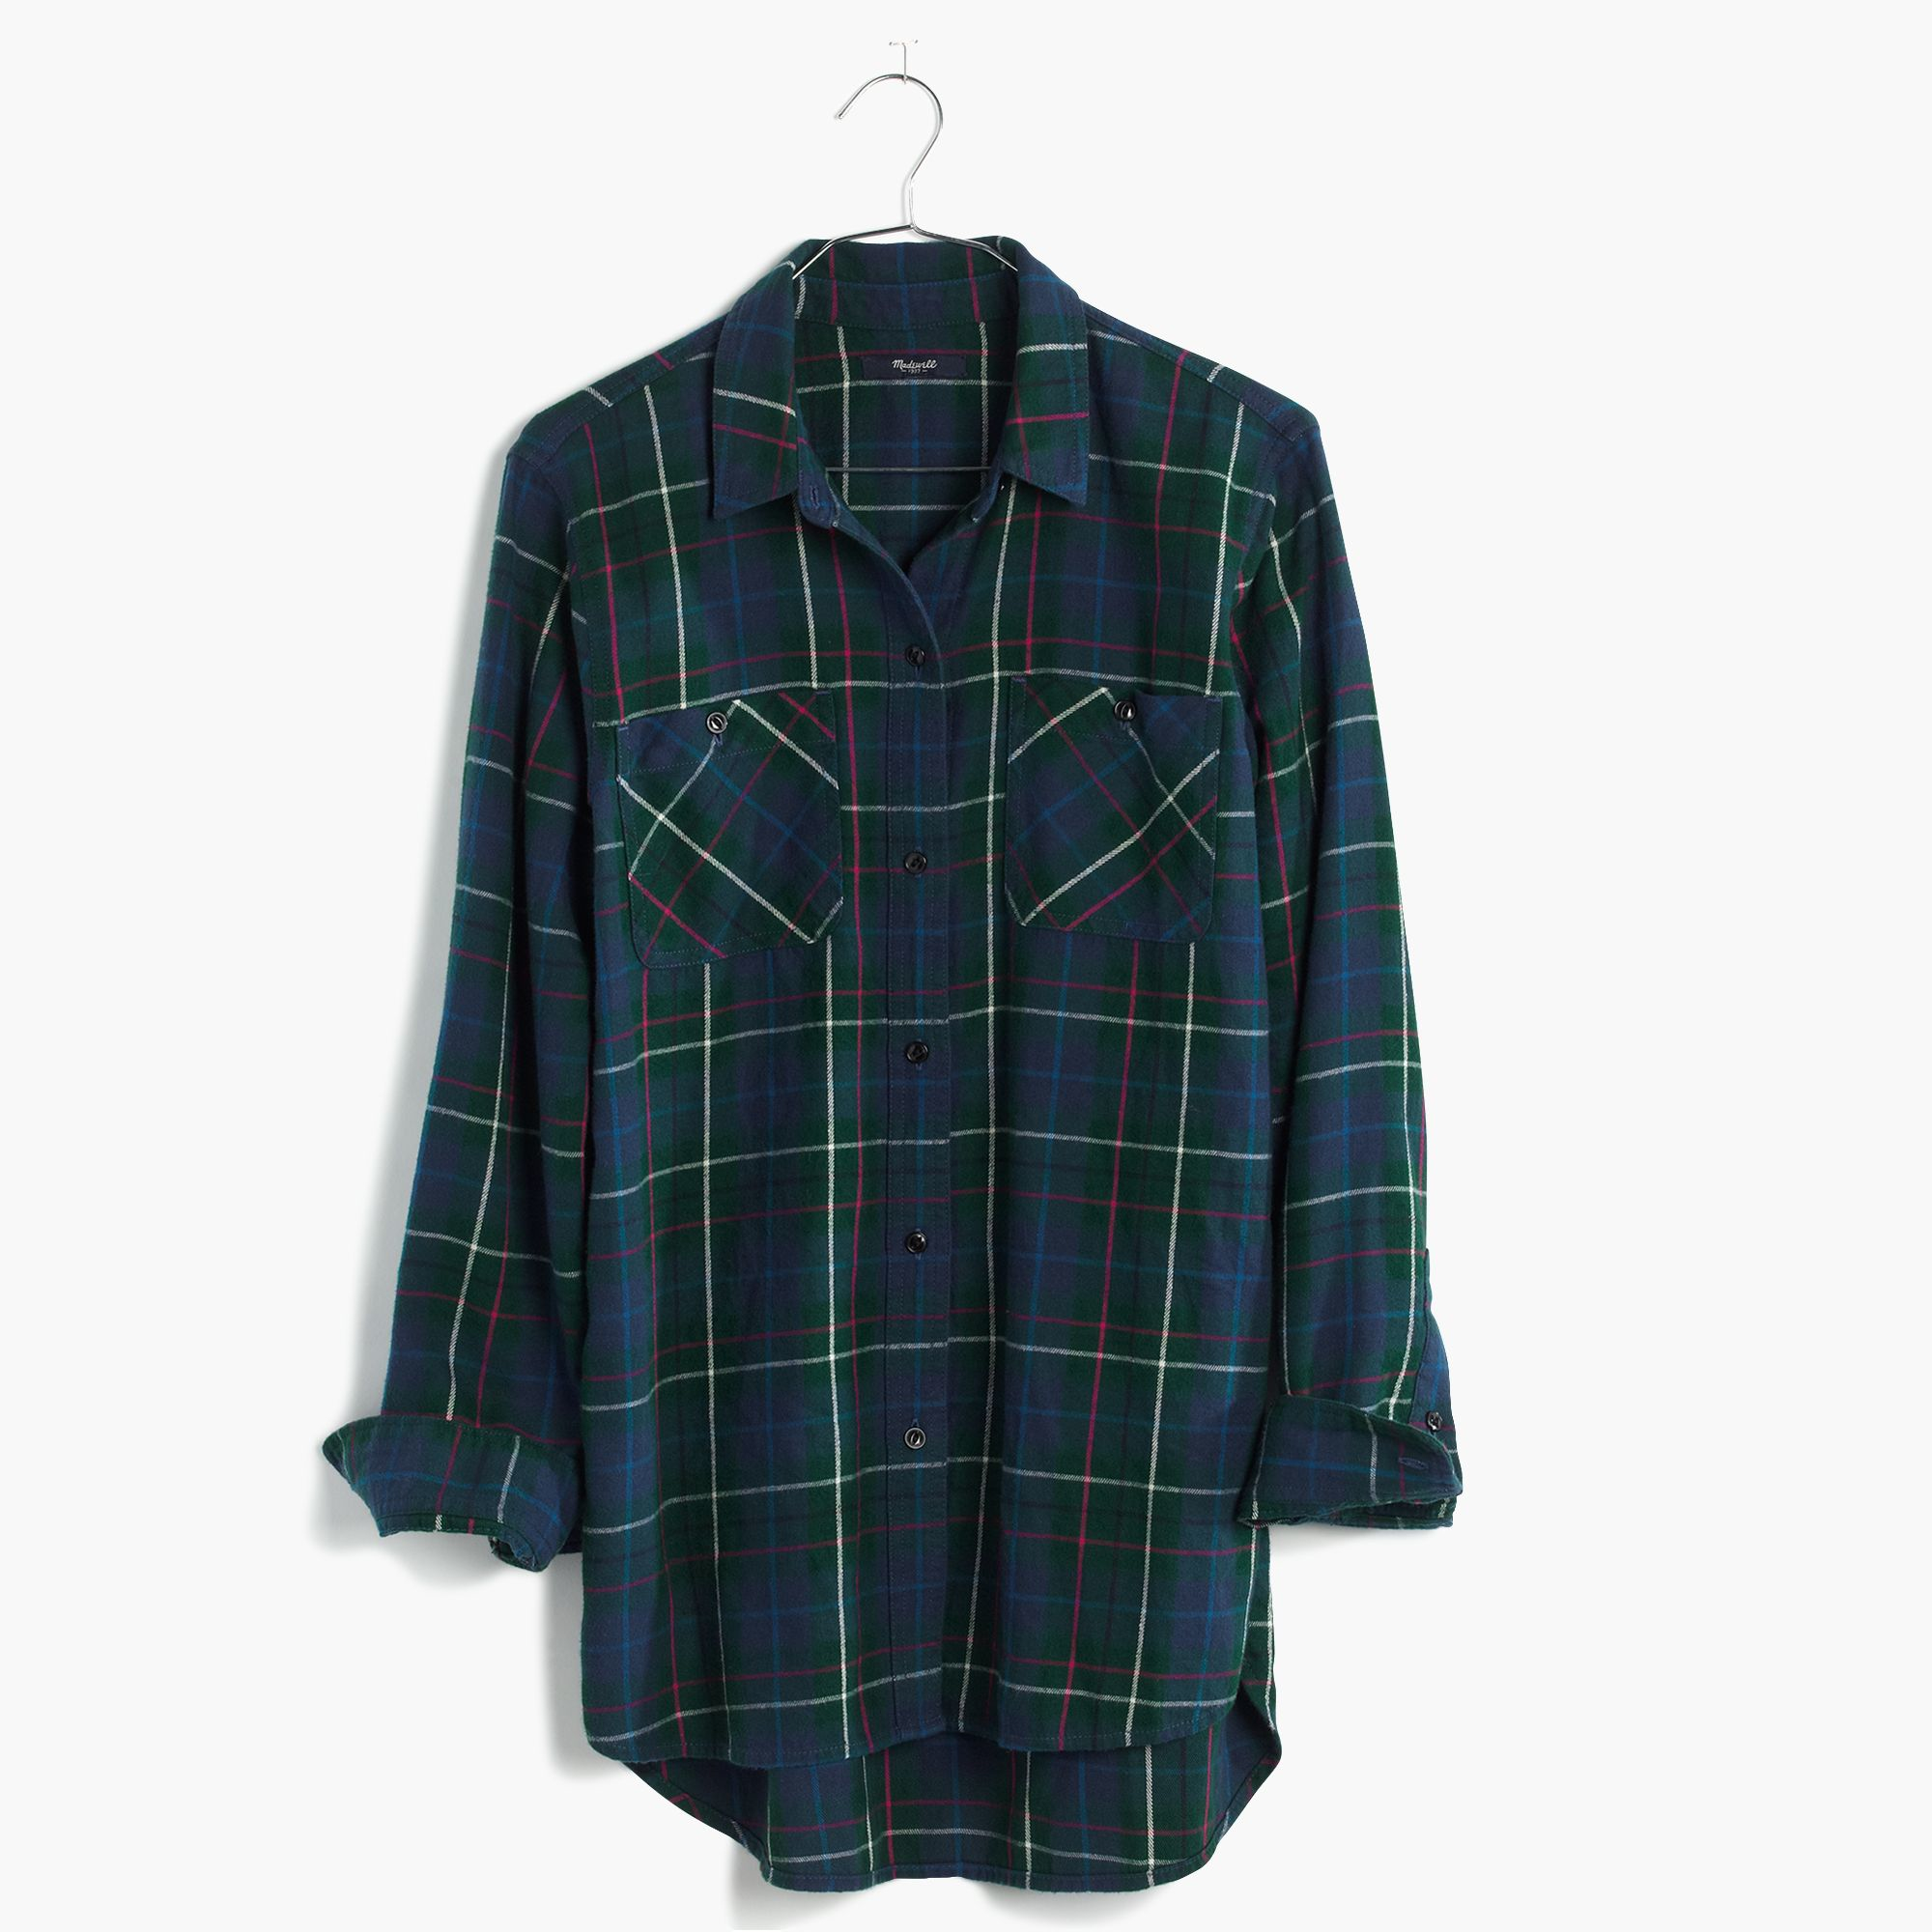 madewell-gallery-green-flannel-ex-boyfriend-shirt-in-ontario-plaid-green-product-1-745128125-normal.jpg